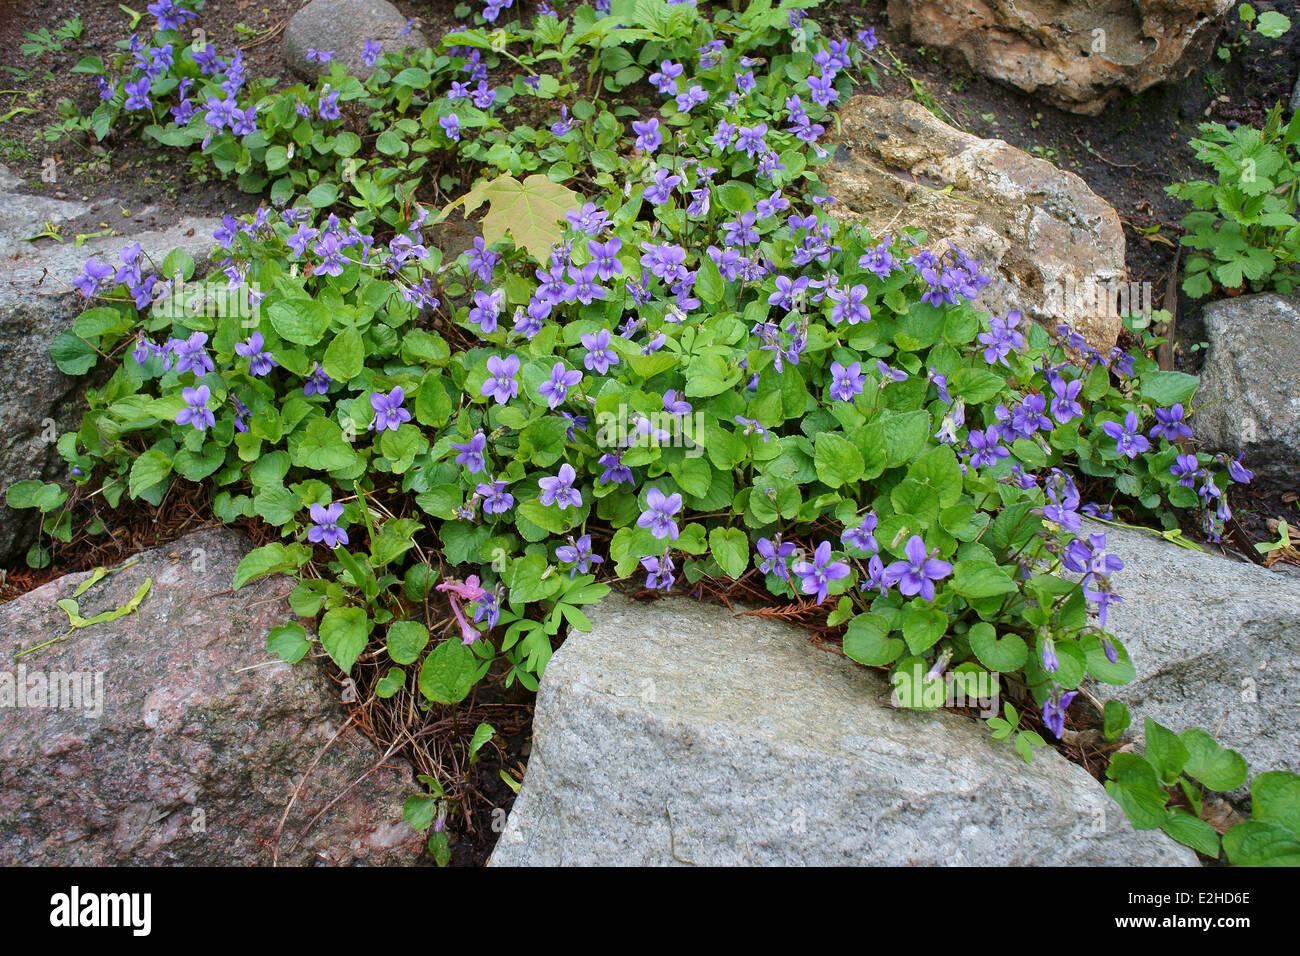 Violet flowers blooming on the rocks Viola riviniana - Stock Image